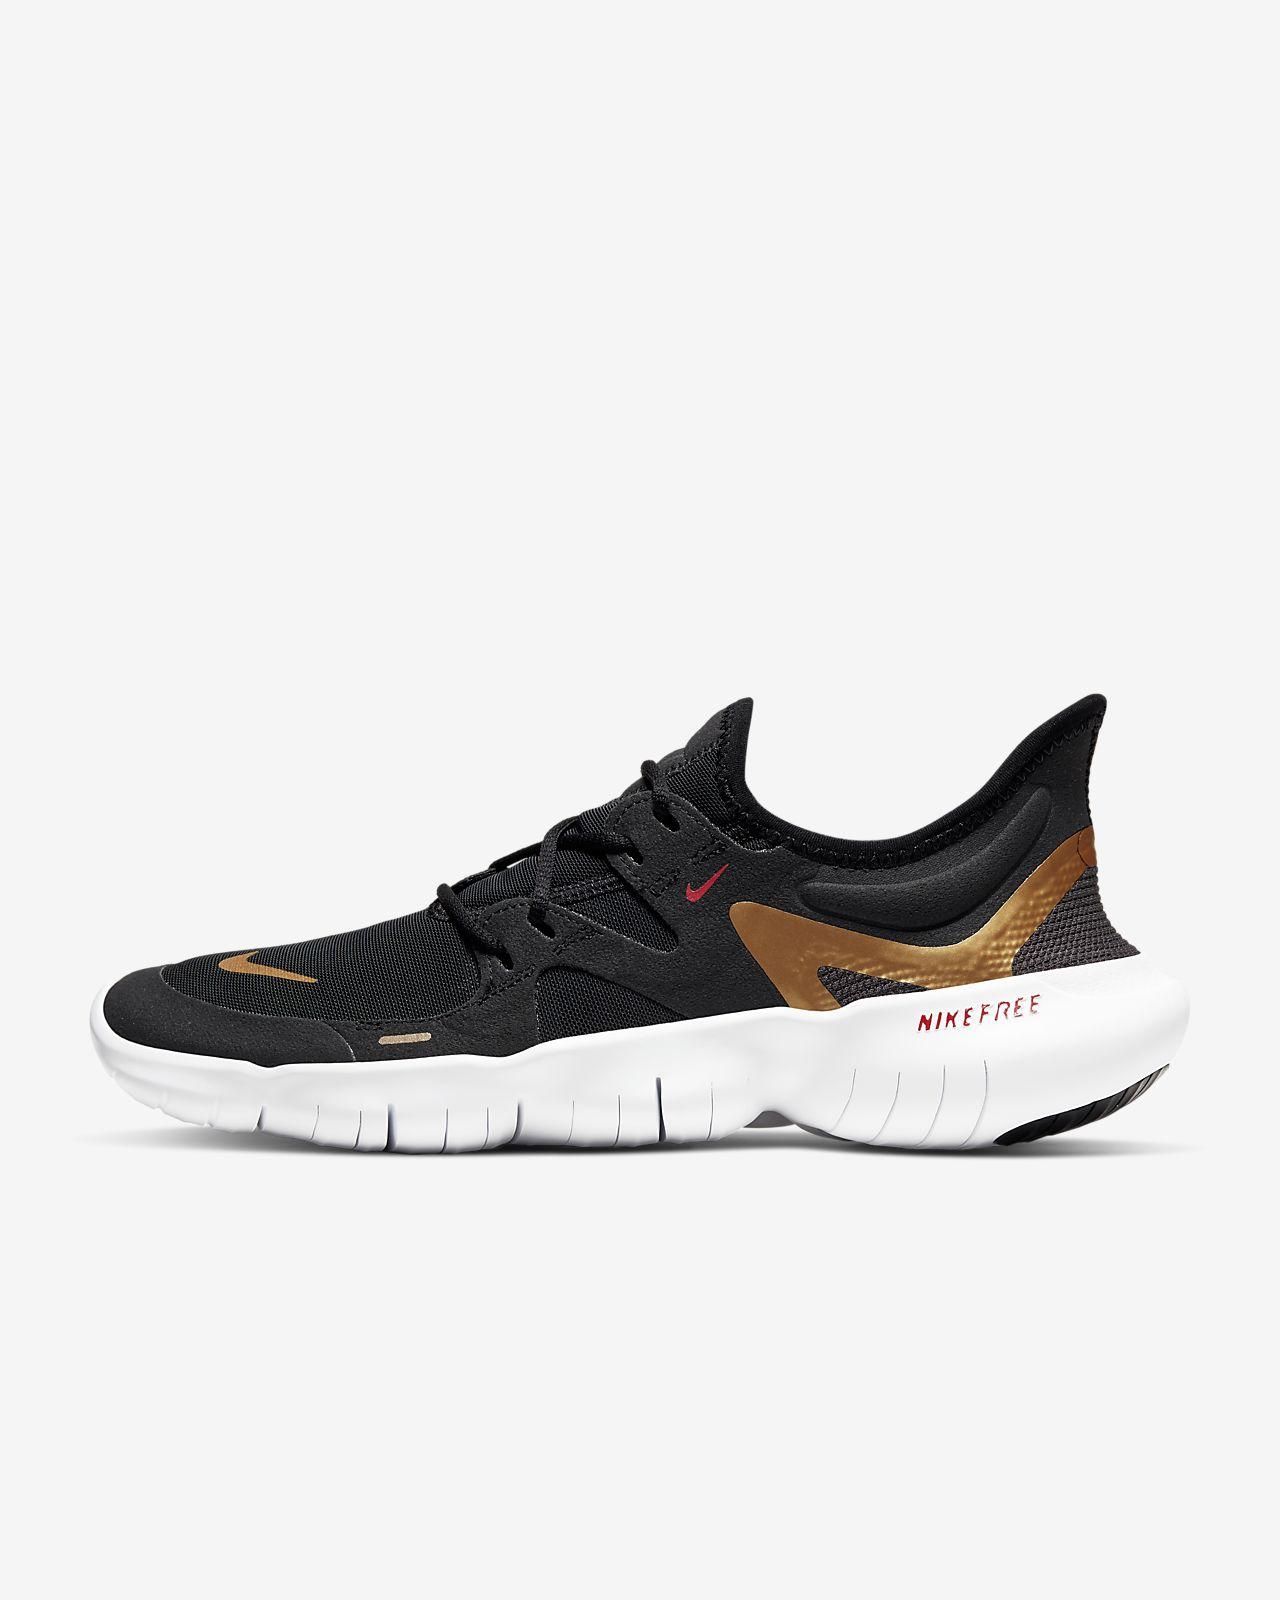 nike free running shoes womens